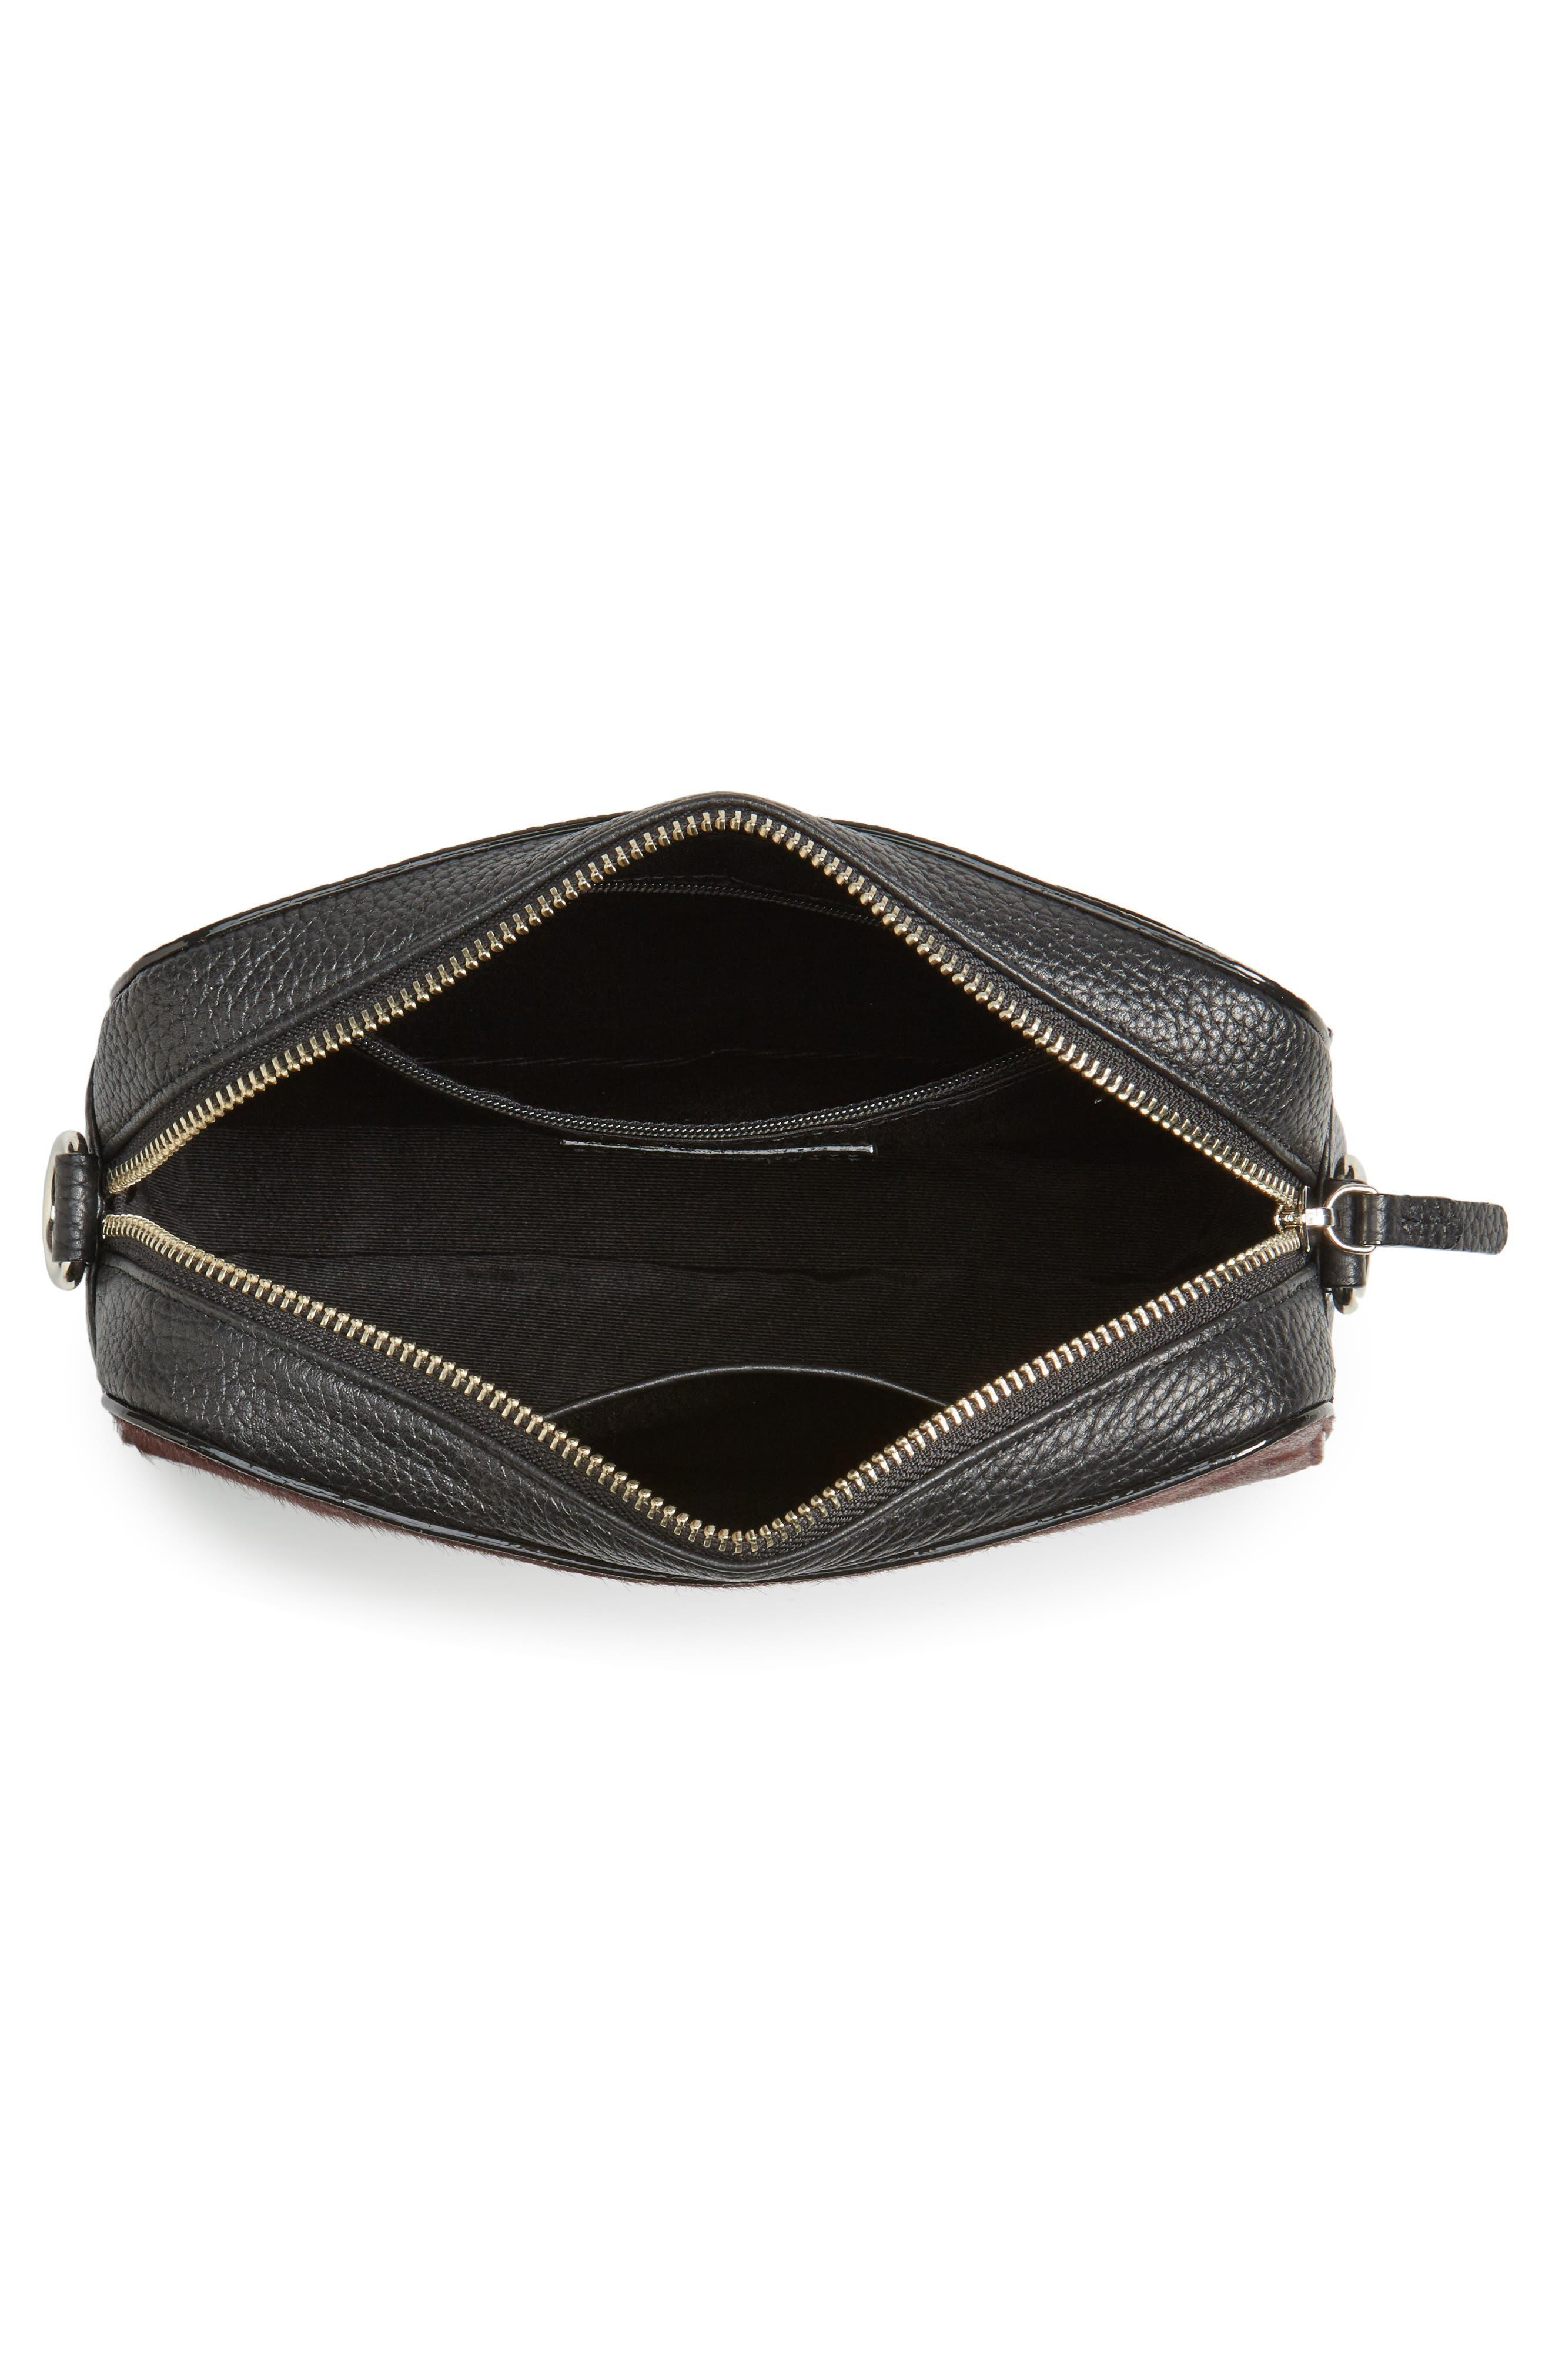 Alternate Image 3  - Nordstrom Ella Leather & Genuine Calf Hair Crossbody Bag